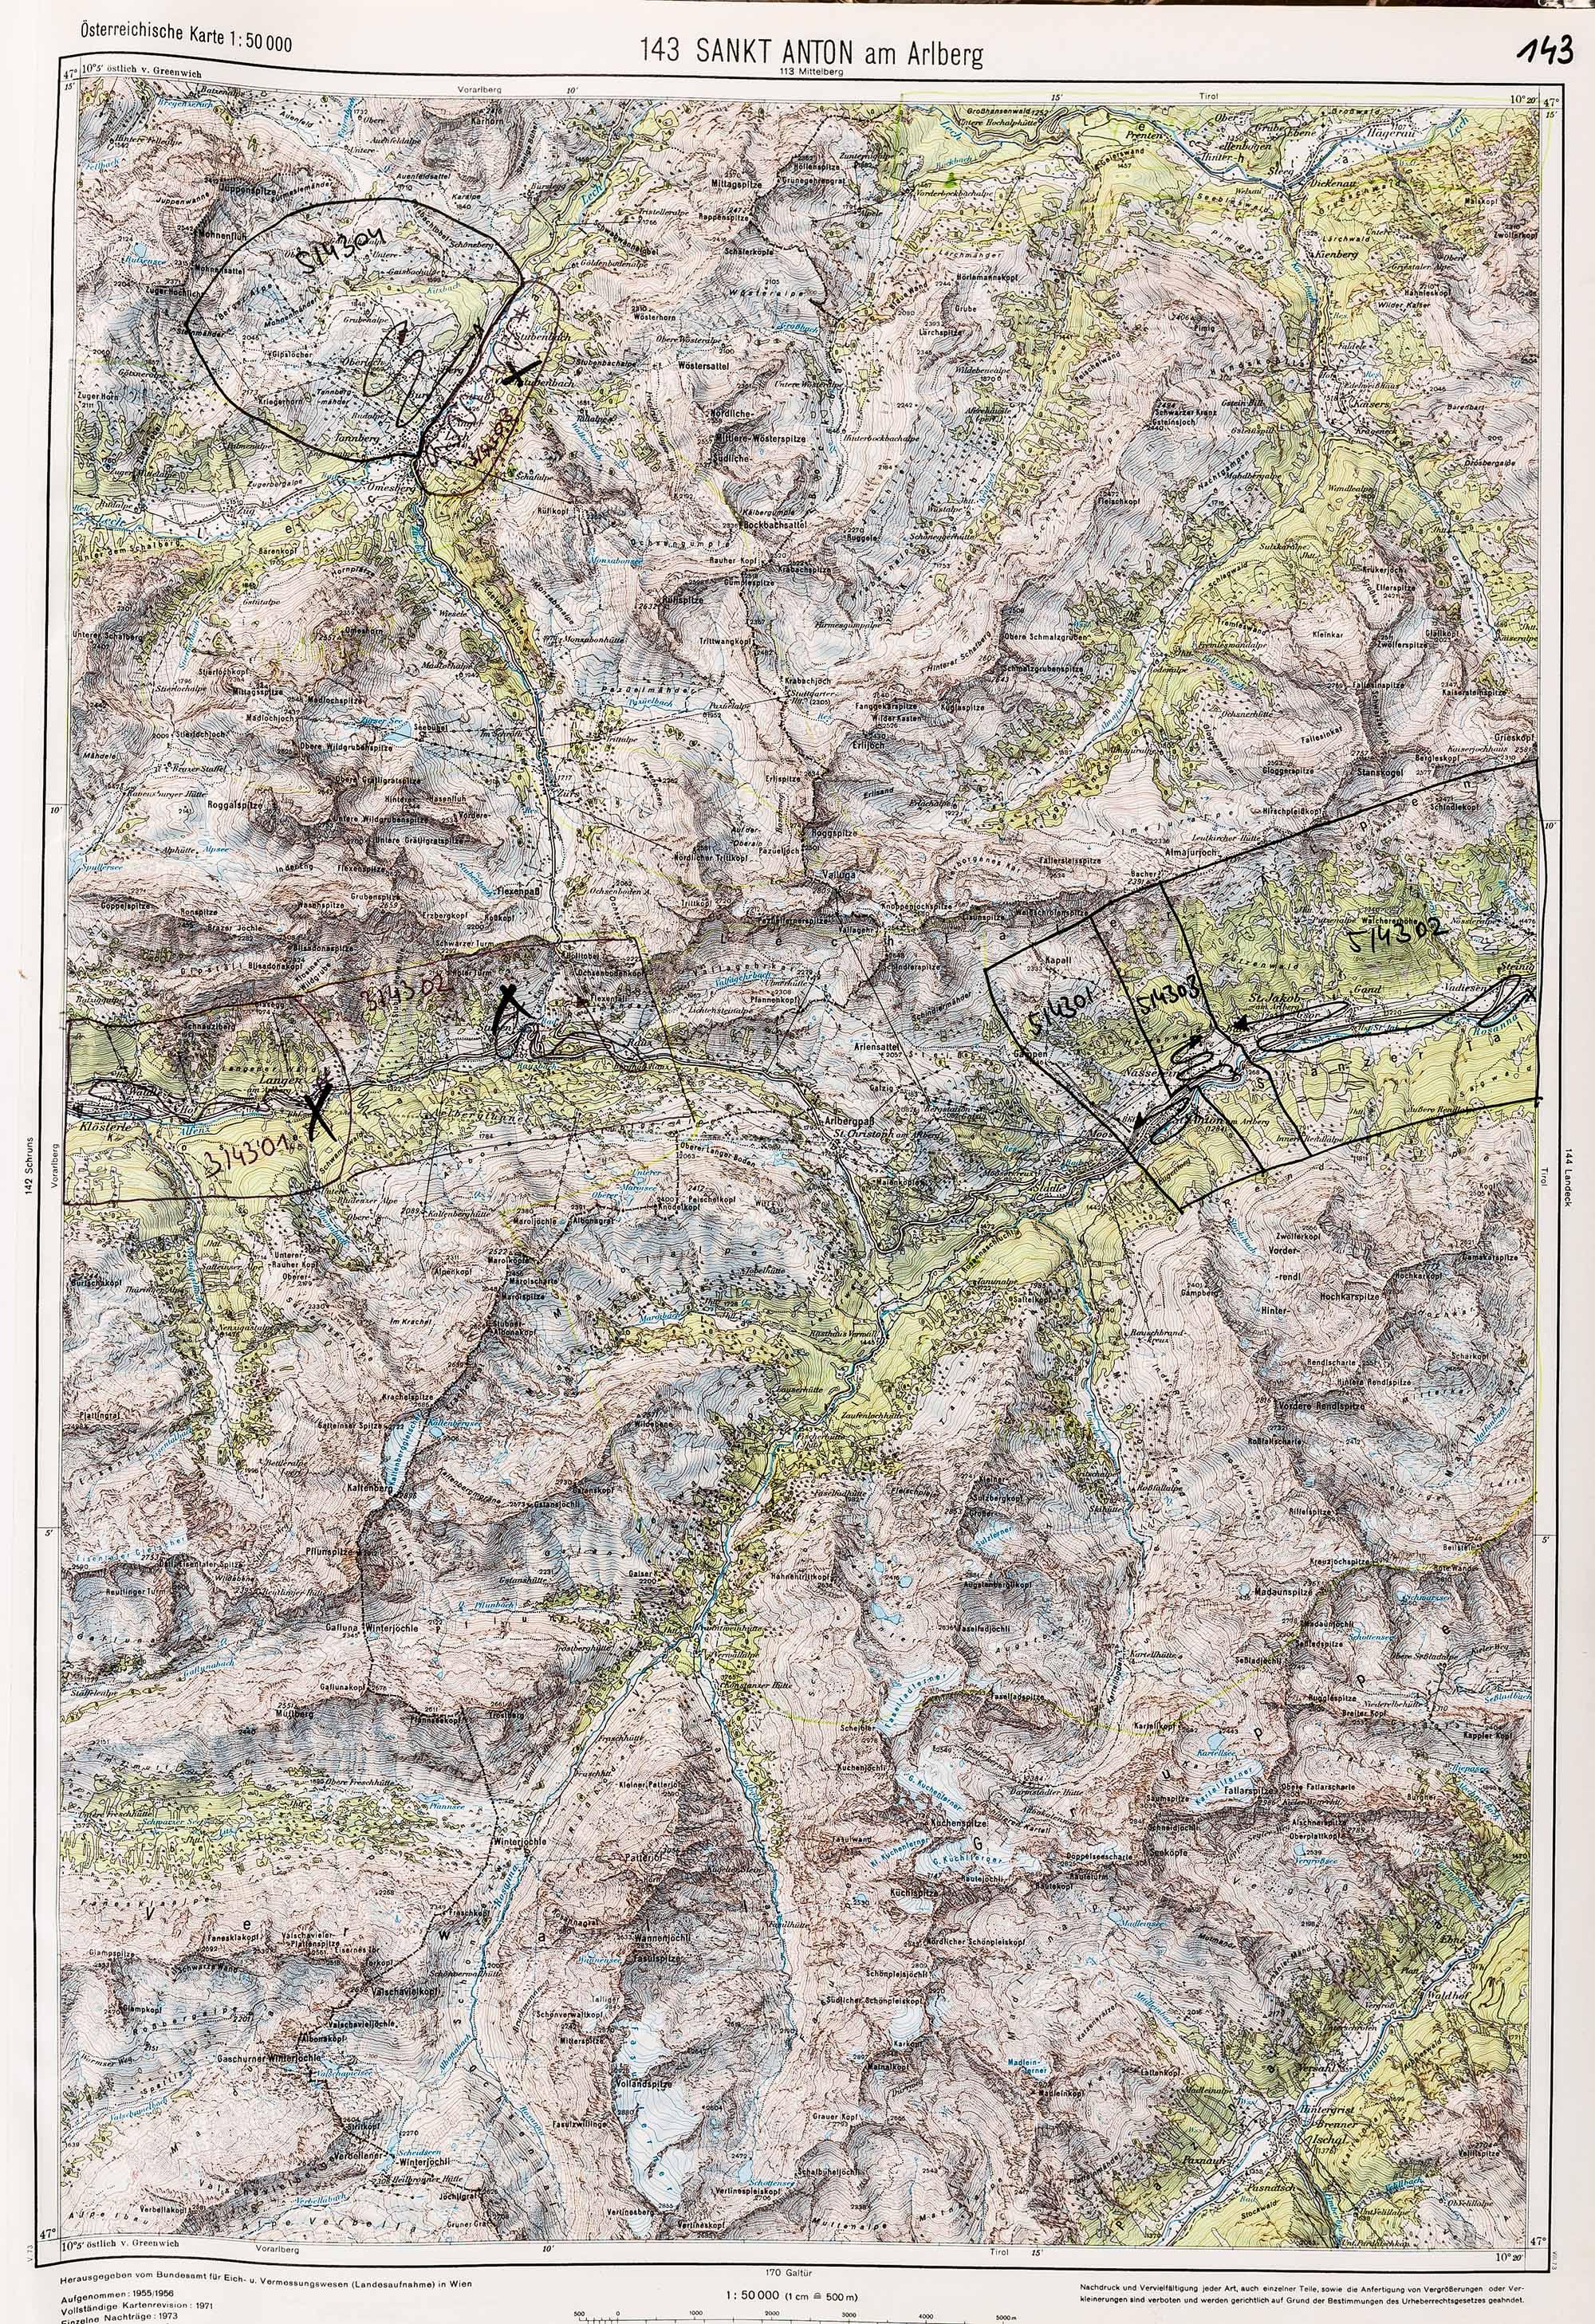 1983-1986 Karte 143